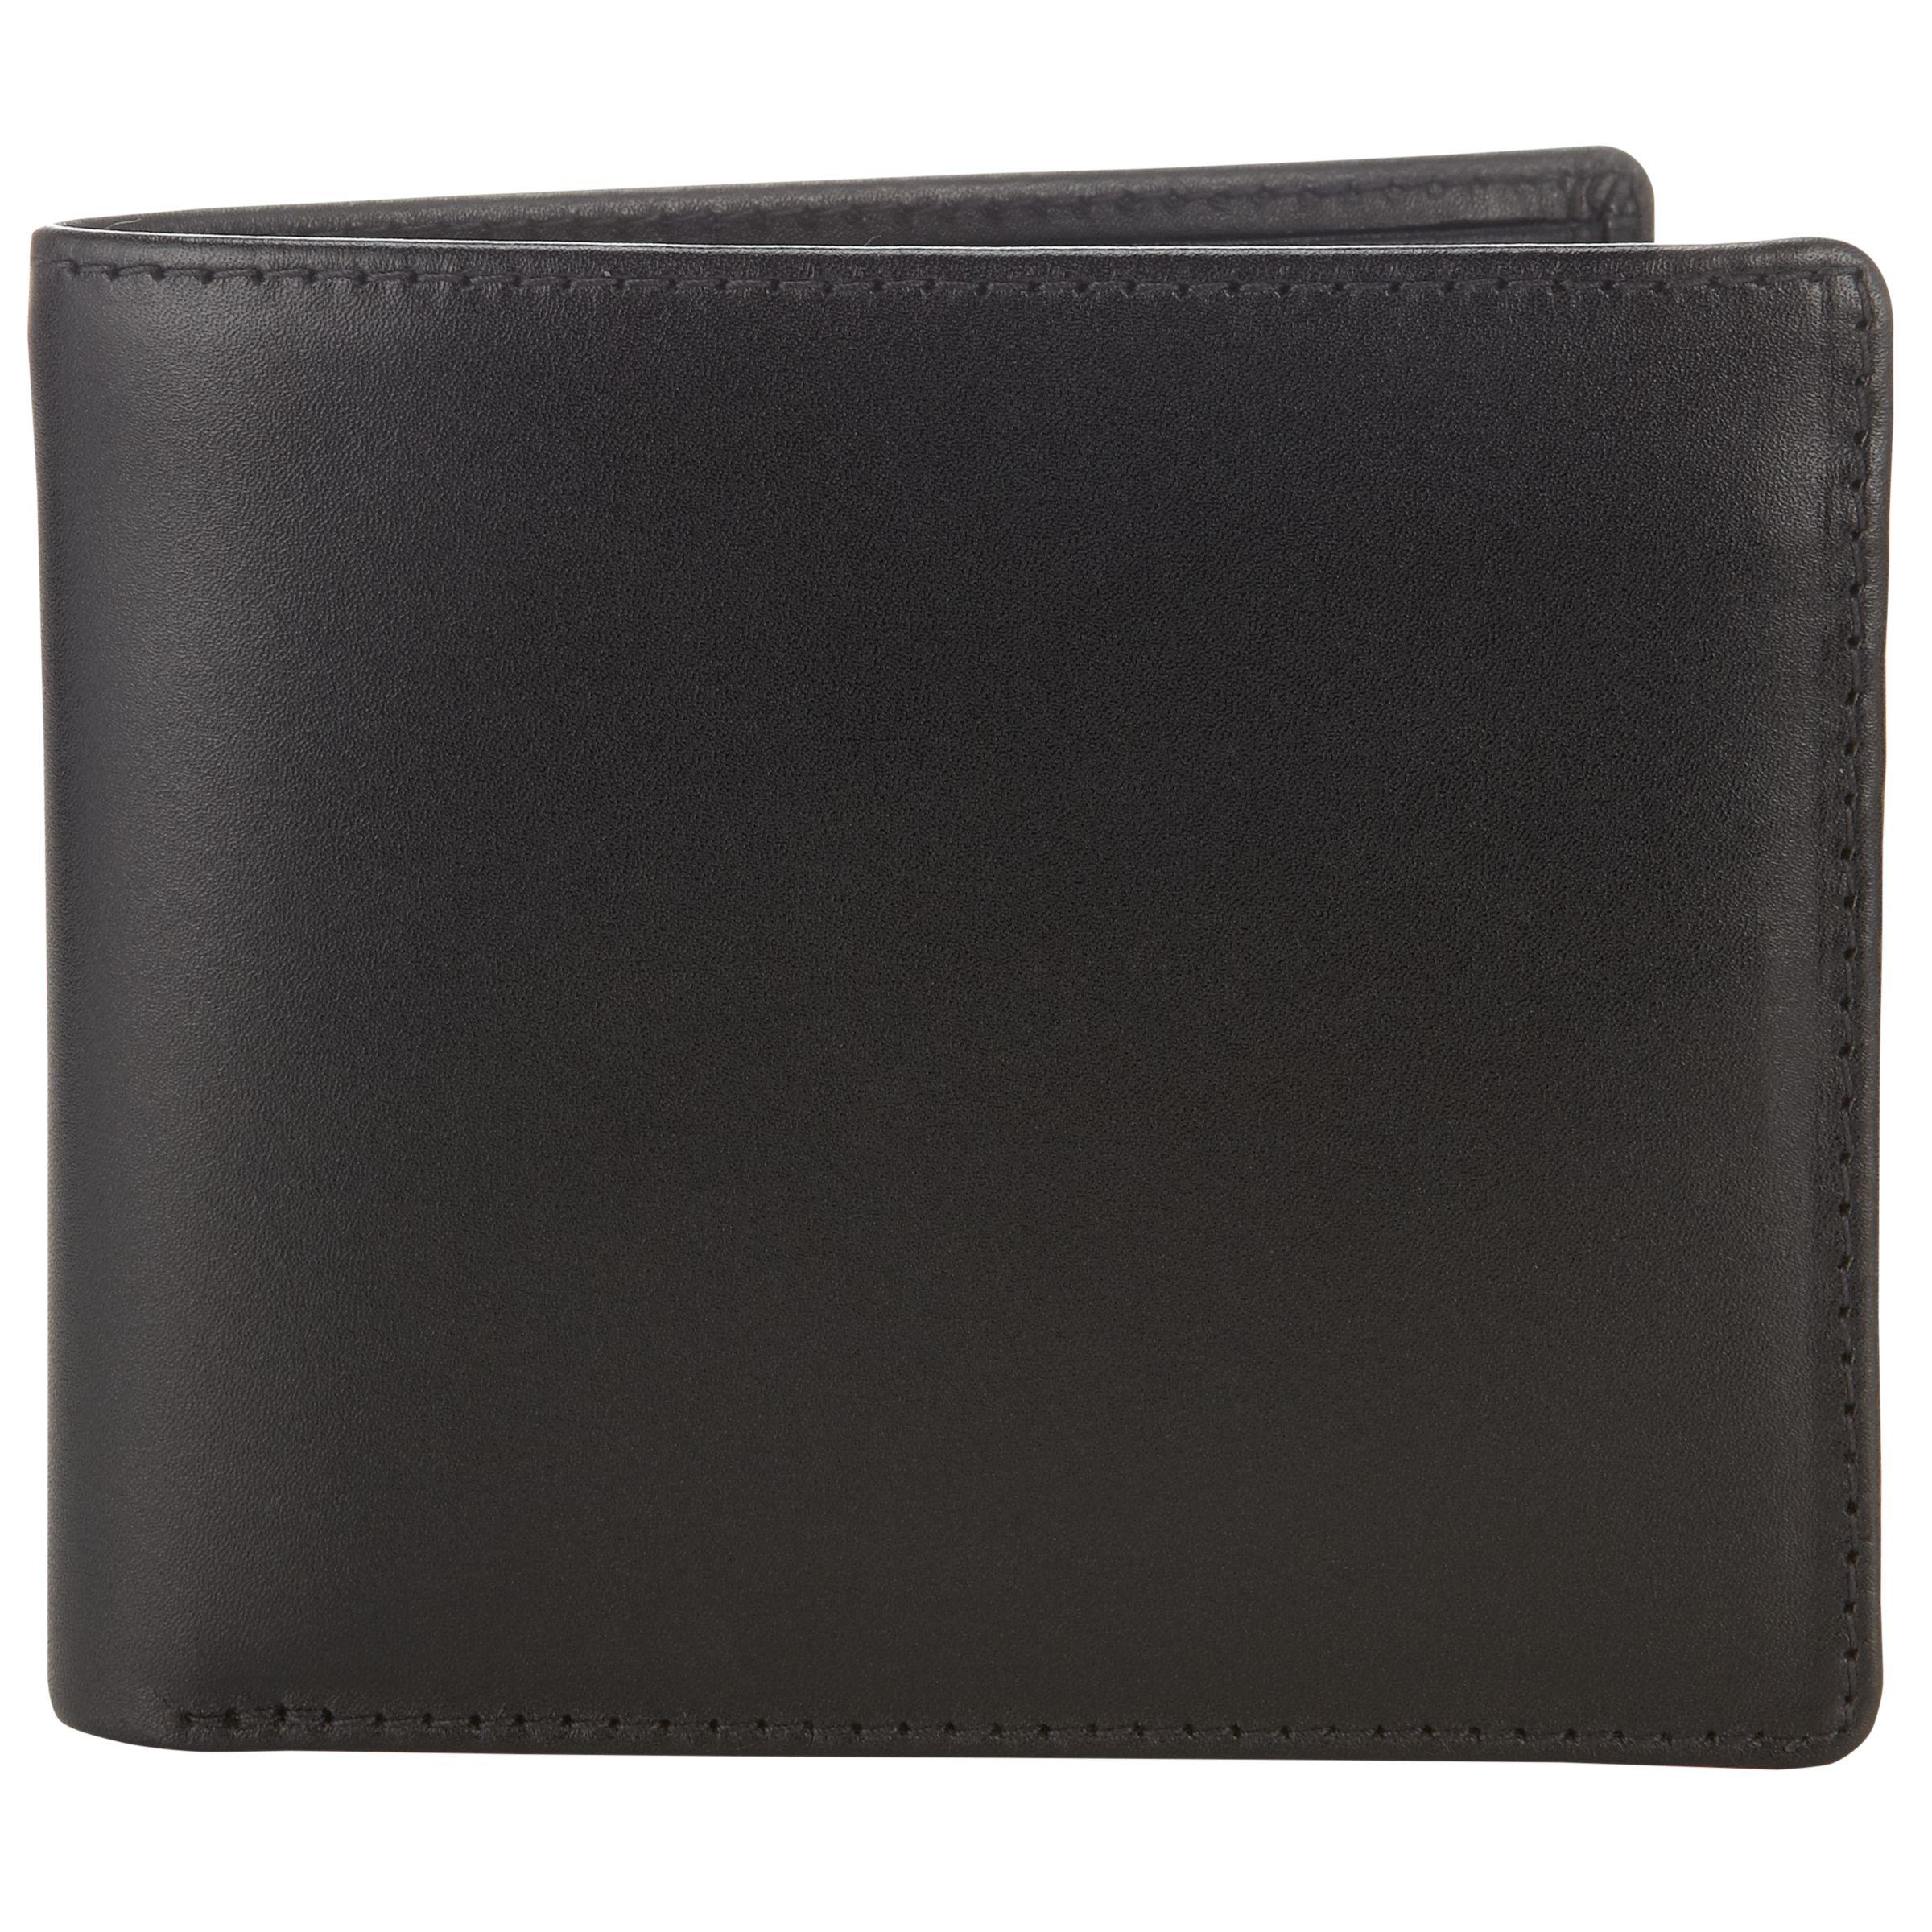 Launer Premium Leather Bi-Fold Wallet 230222495 product image